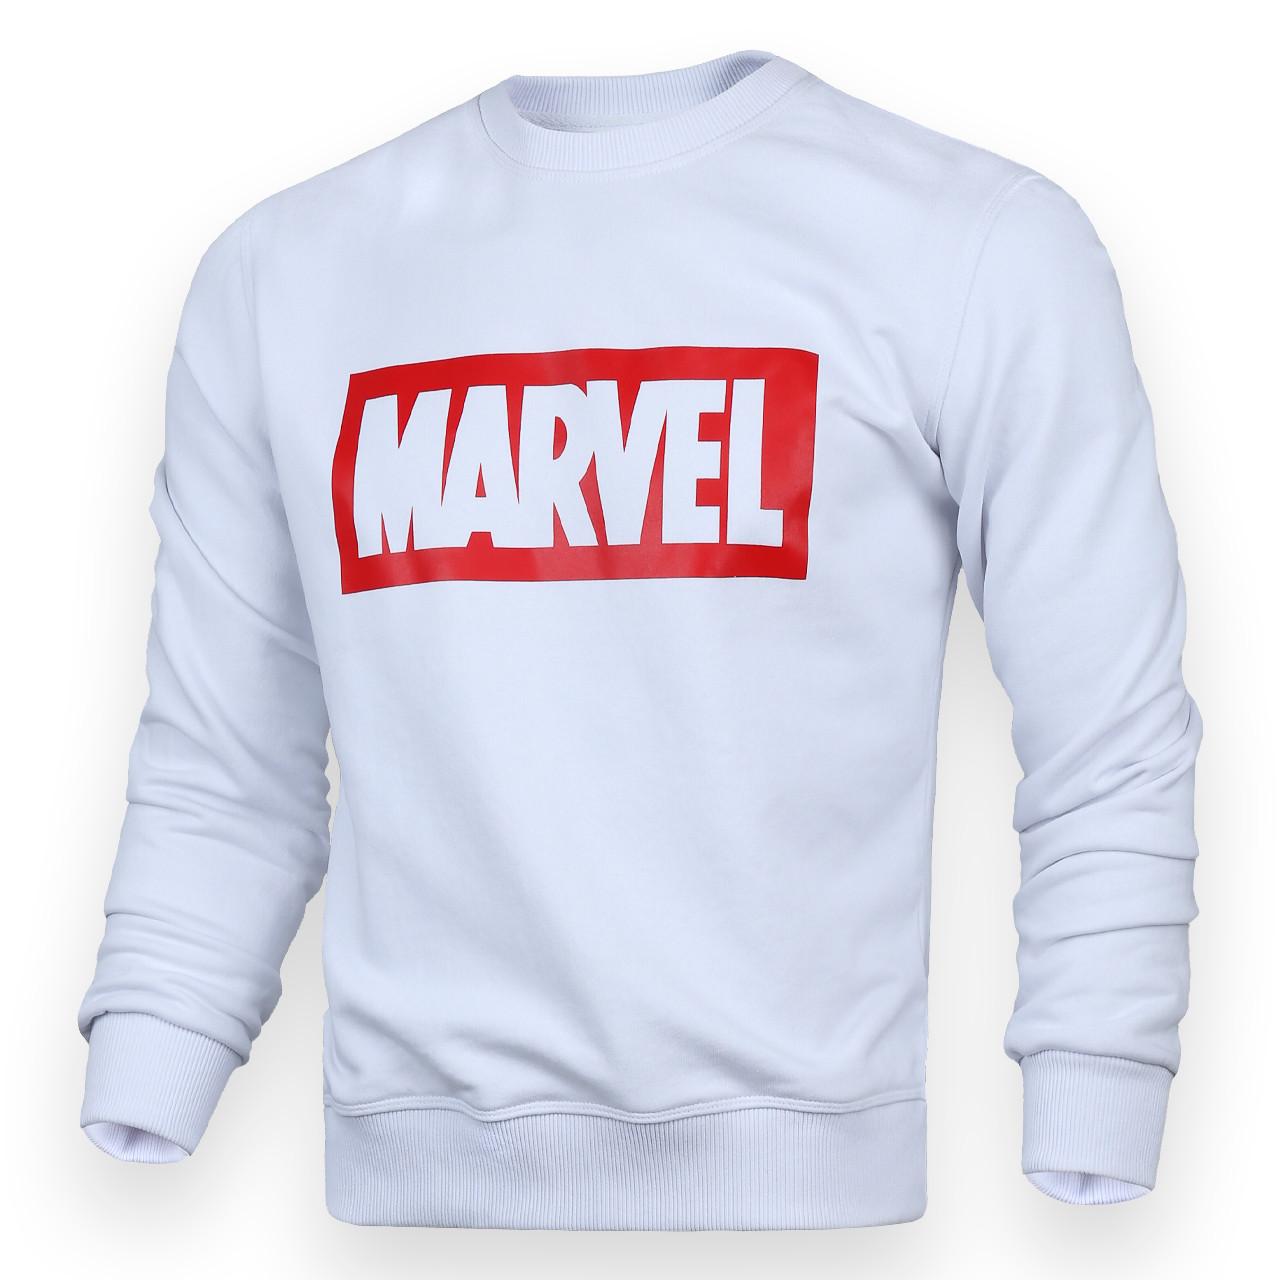 Свитшот мужской белый MARVEL с лого WHT S(Р) 18-502-001